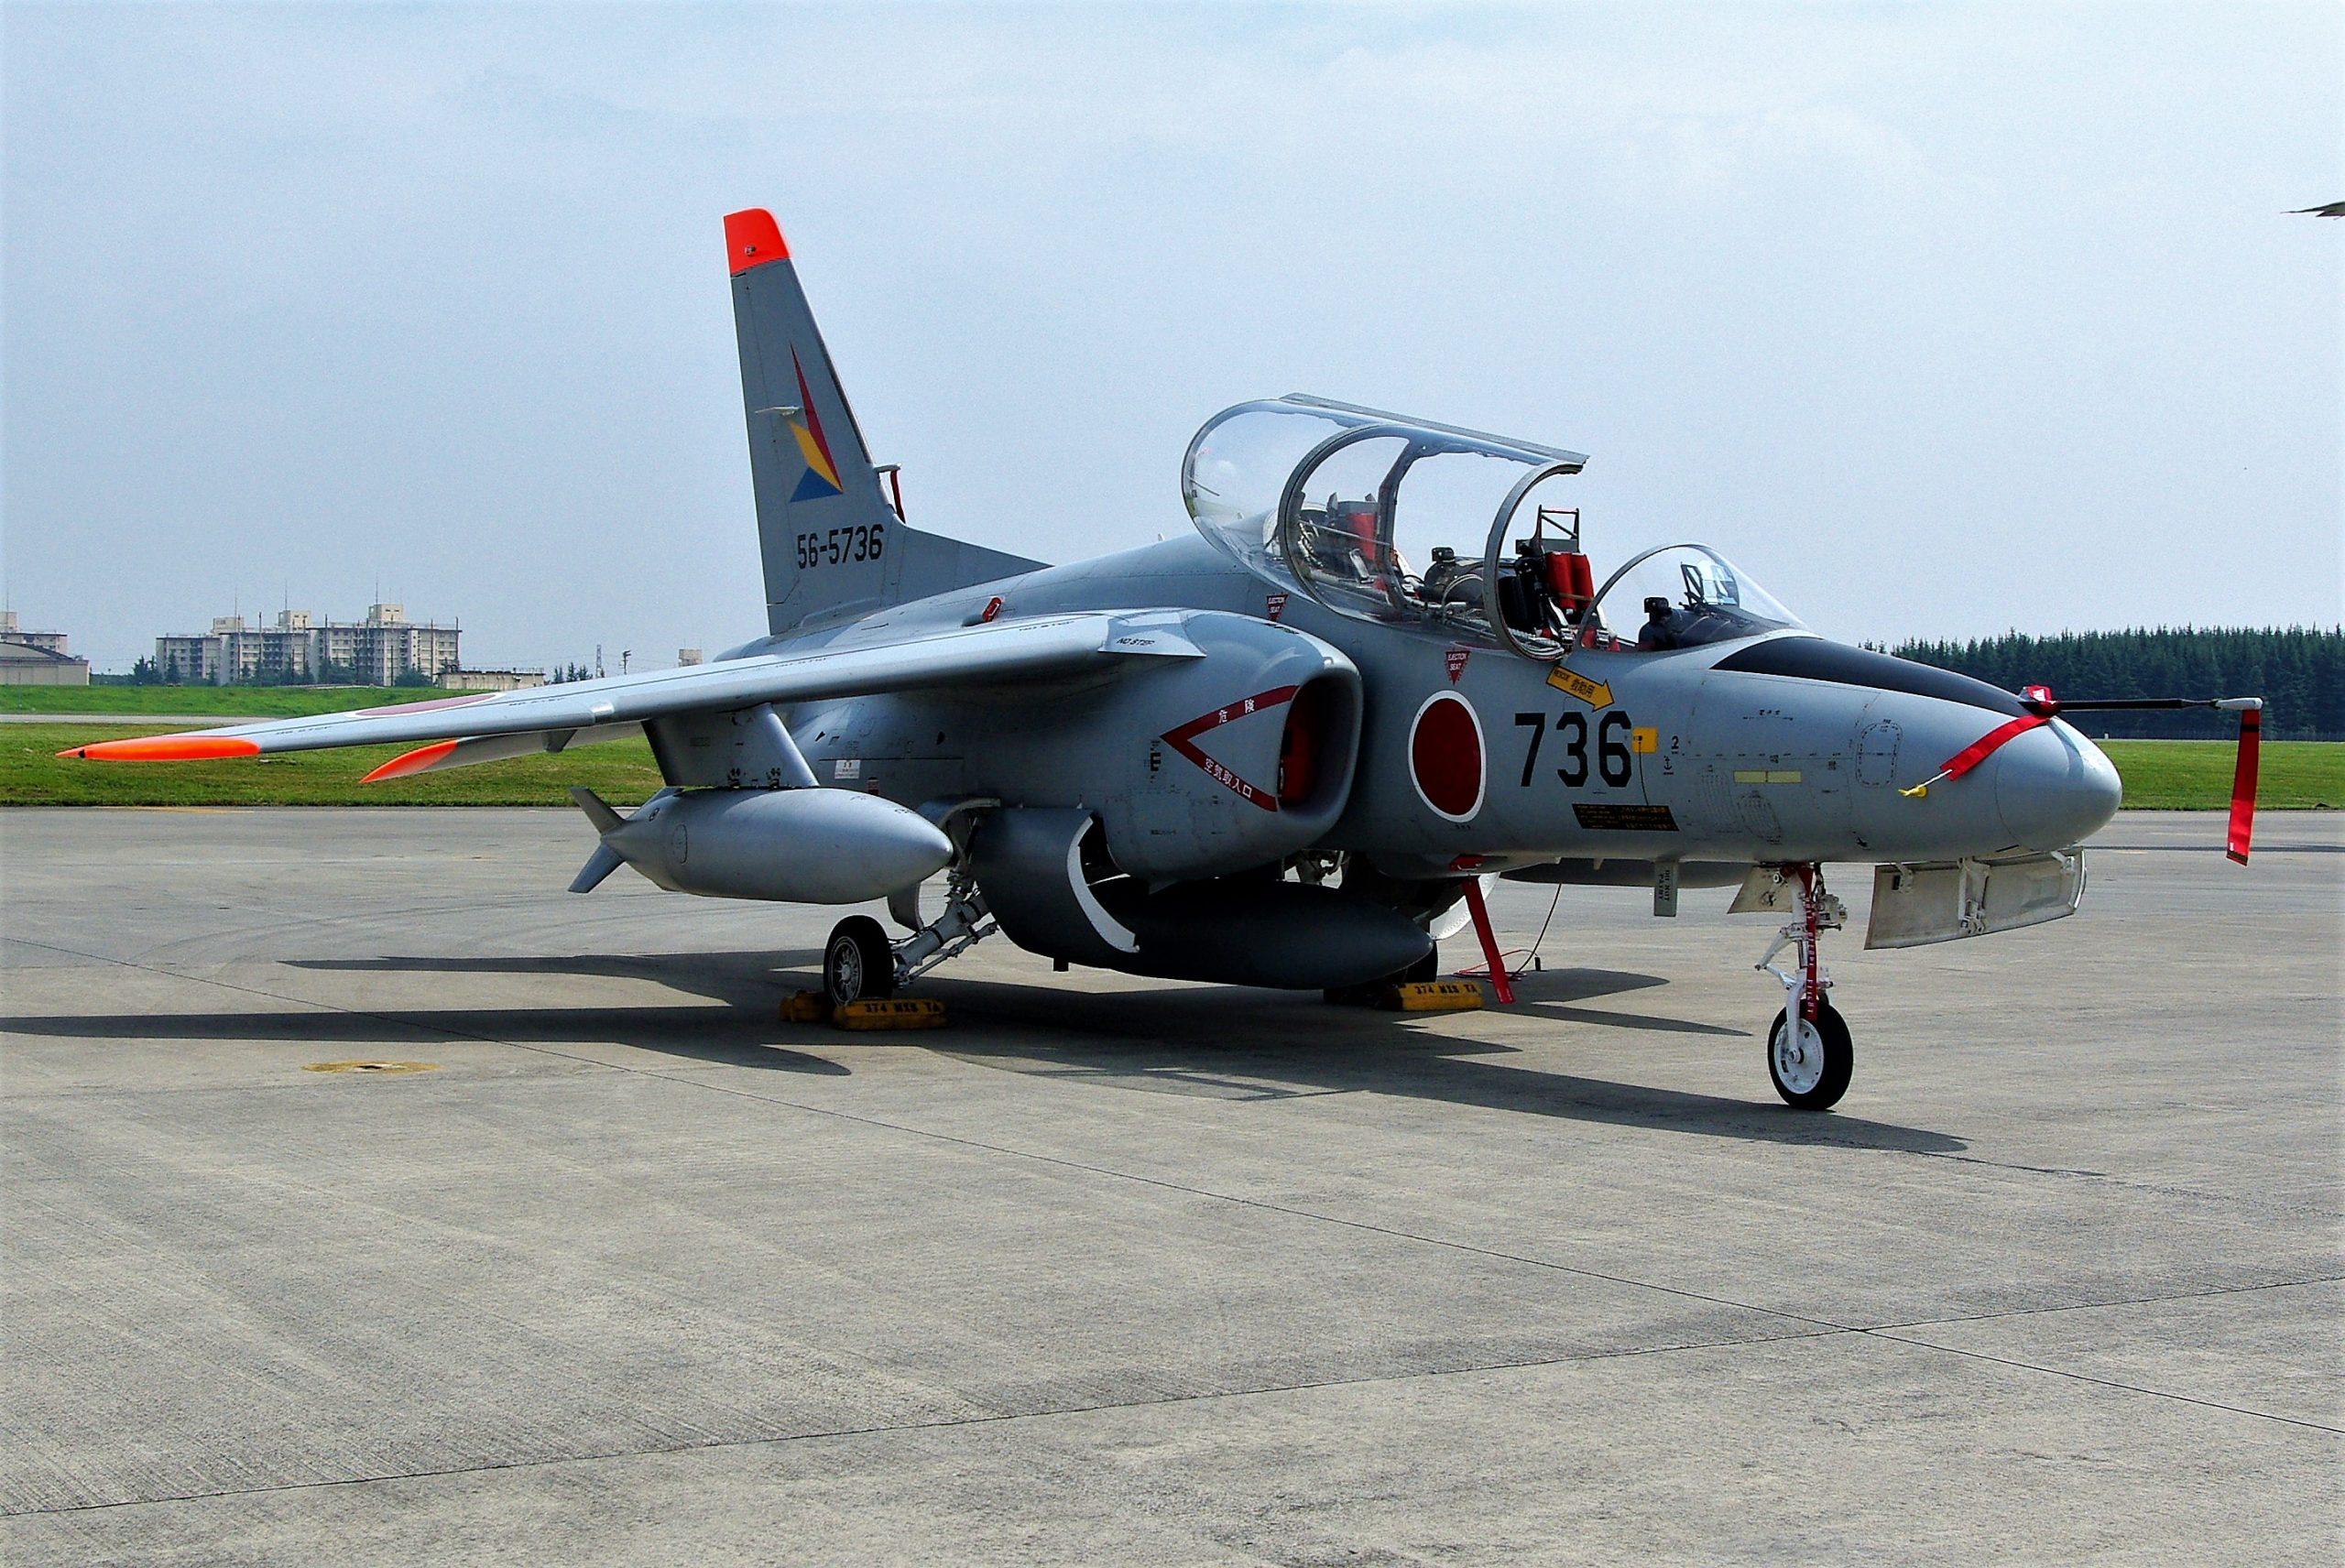 Kawasaki Aeroplane Engine, fighter jet